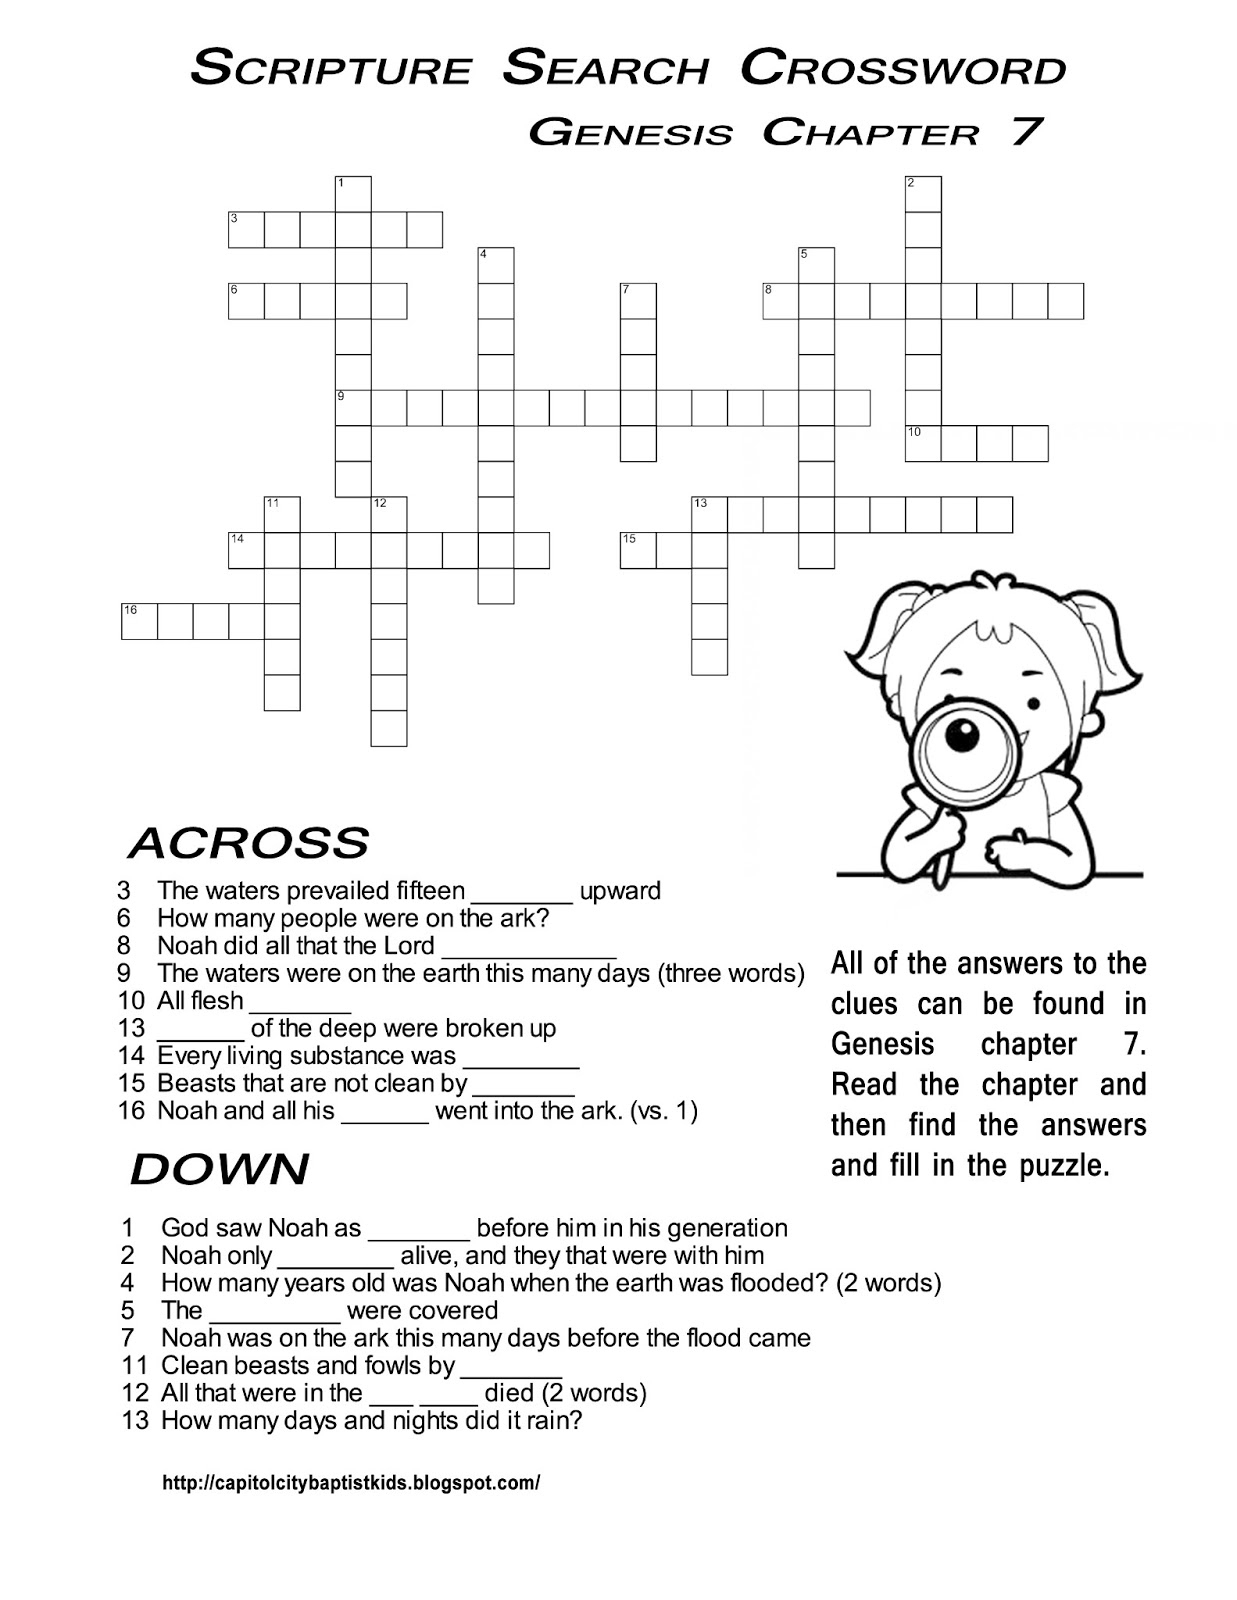 Ccbc Kids Corner: Scripture Search Crossword #2 - Printable Crossword #2